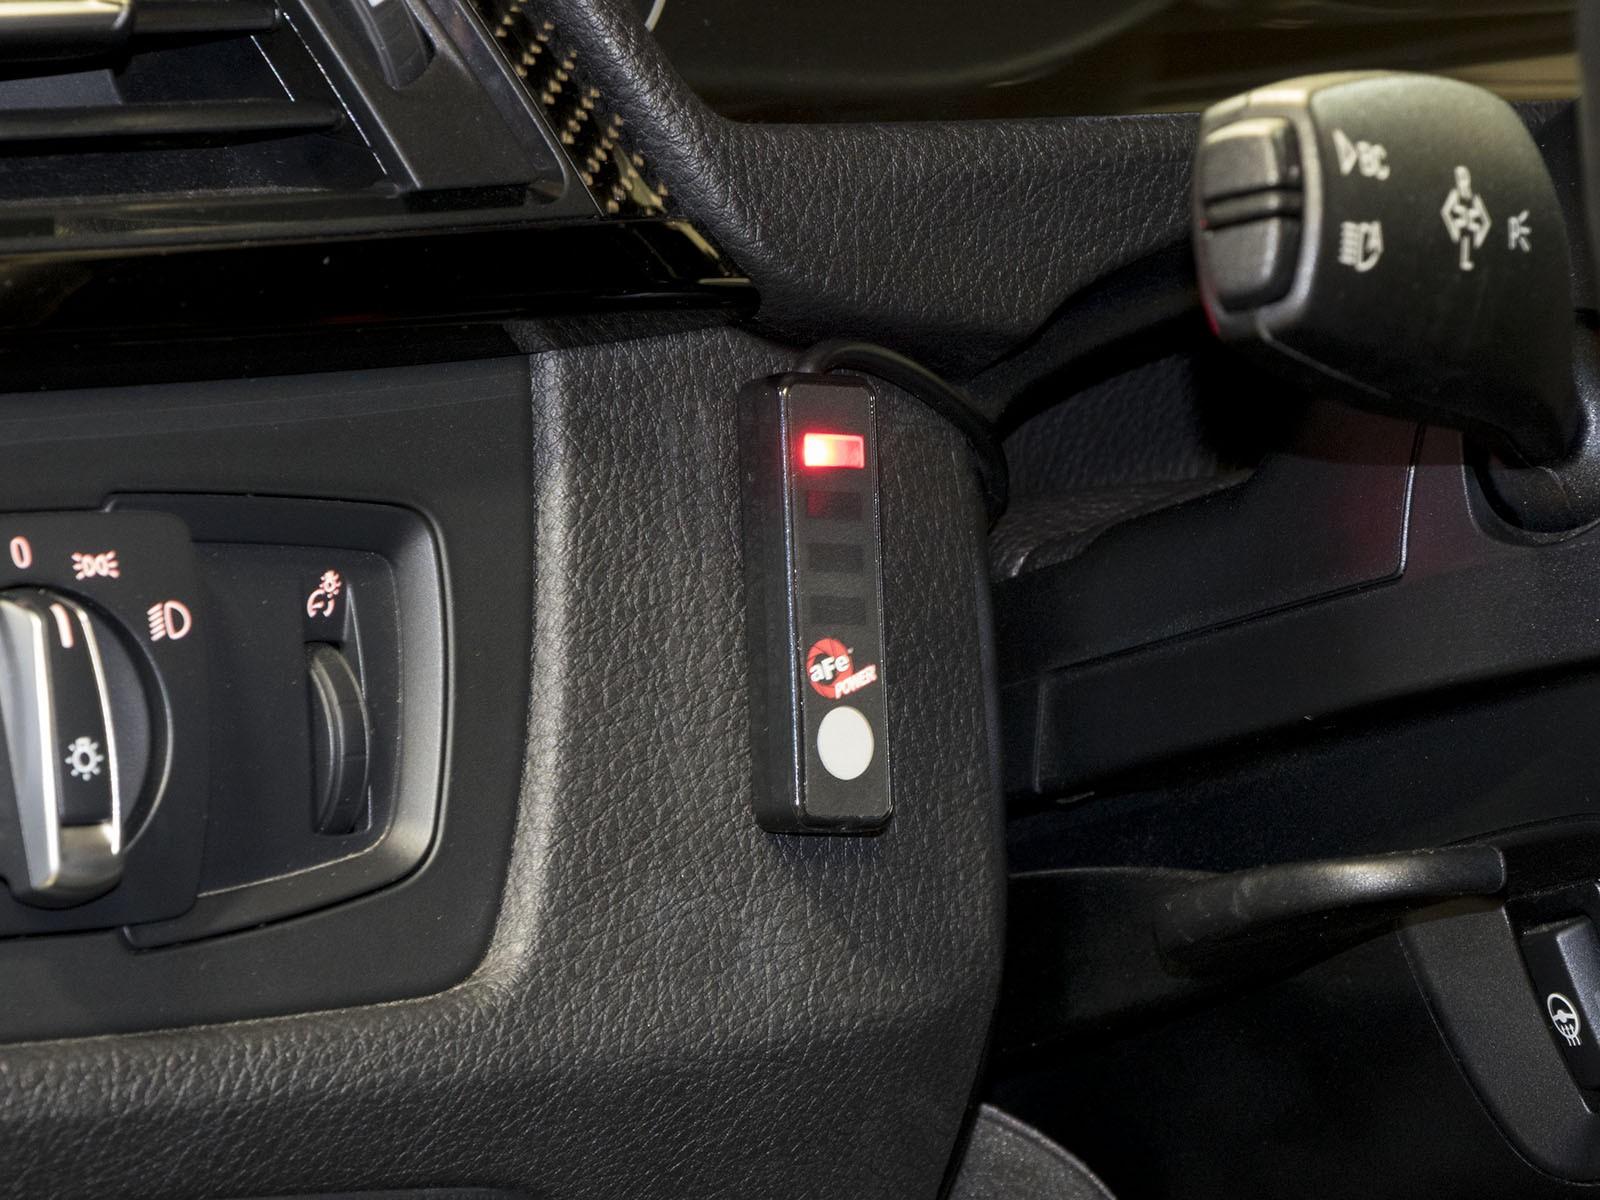 Scorcher Gt Power Module Afe 02 Dodge 360 Ecu Wiring Diagram Adds Up To 59 Hp Horsepower 65 Lbs X Ft Torque Max Gains